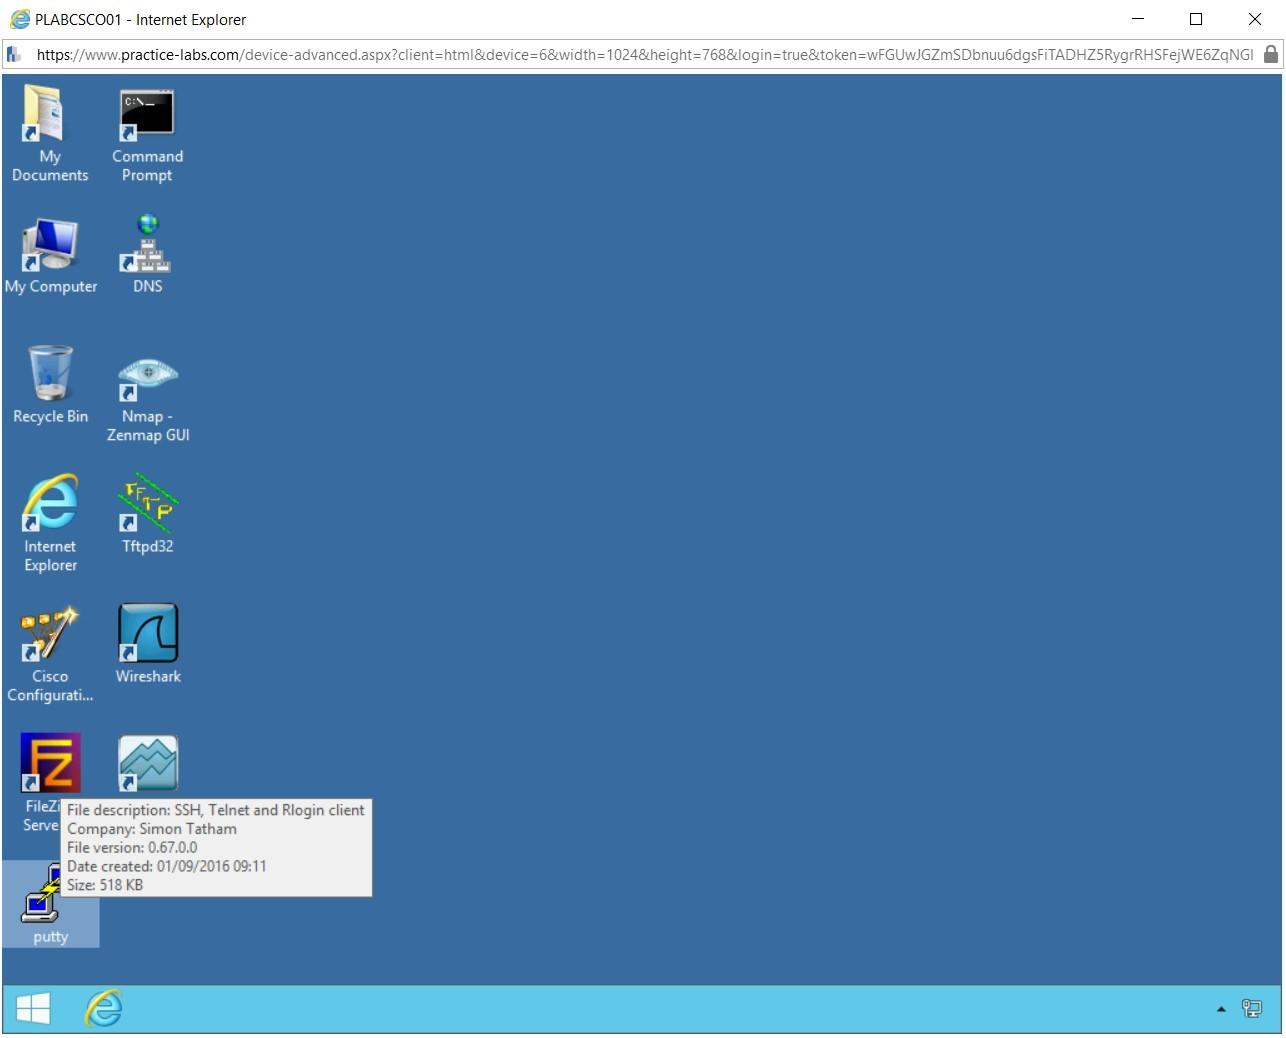 Figure 1.3 Screenshot of PLABCSCO01